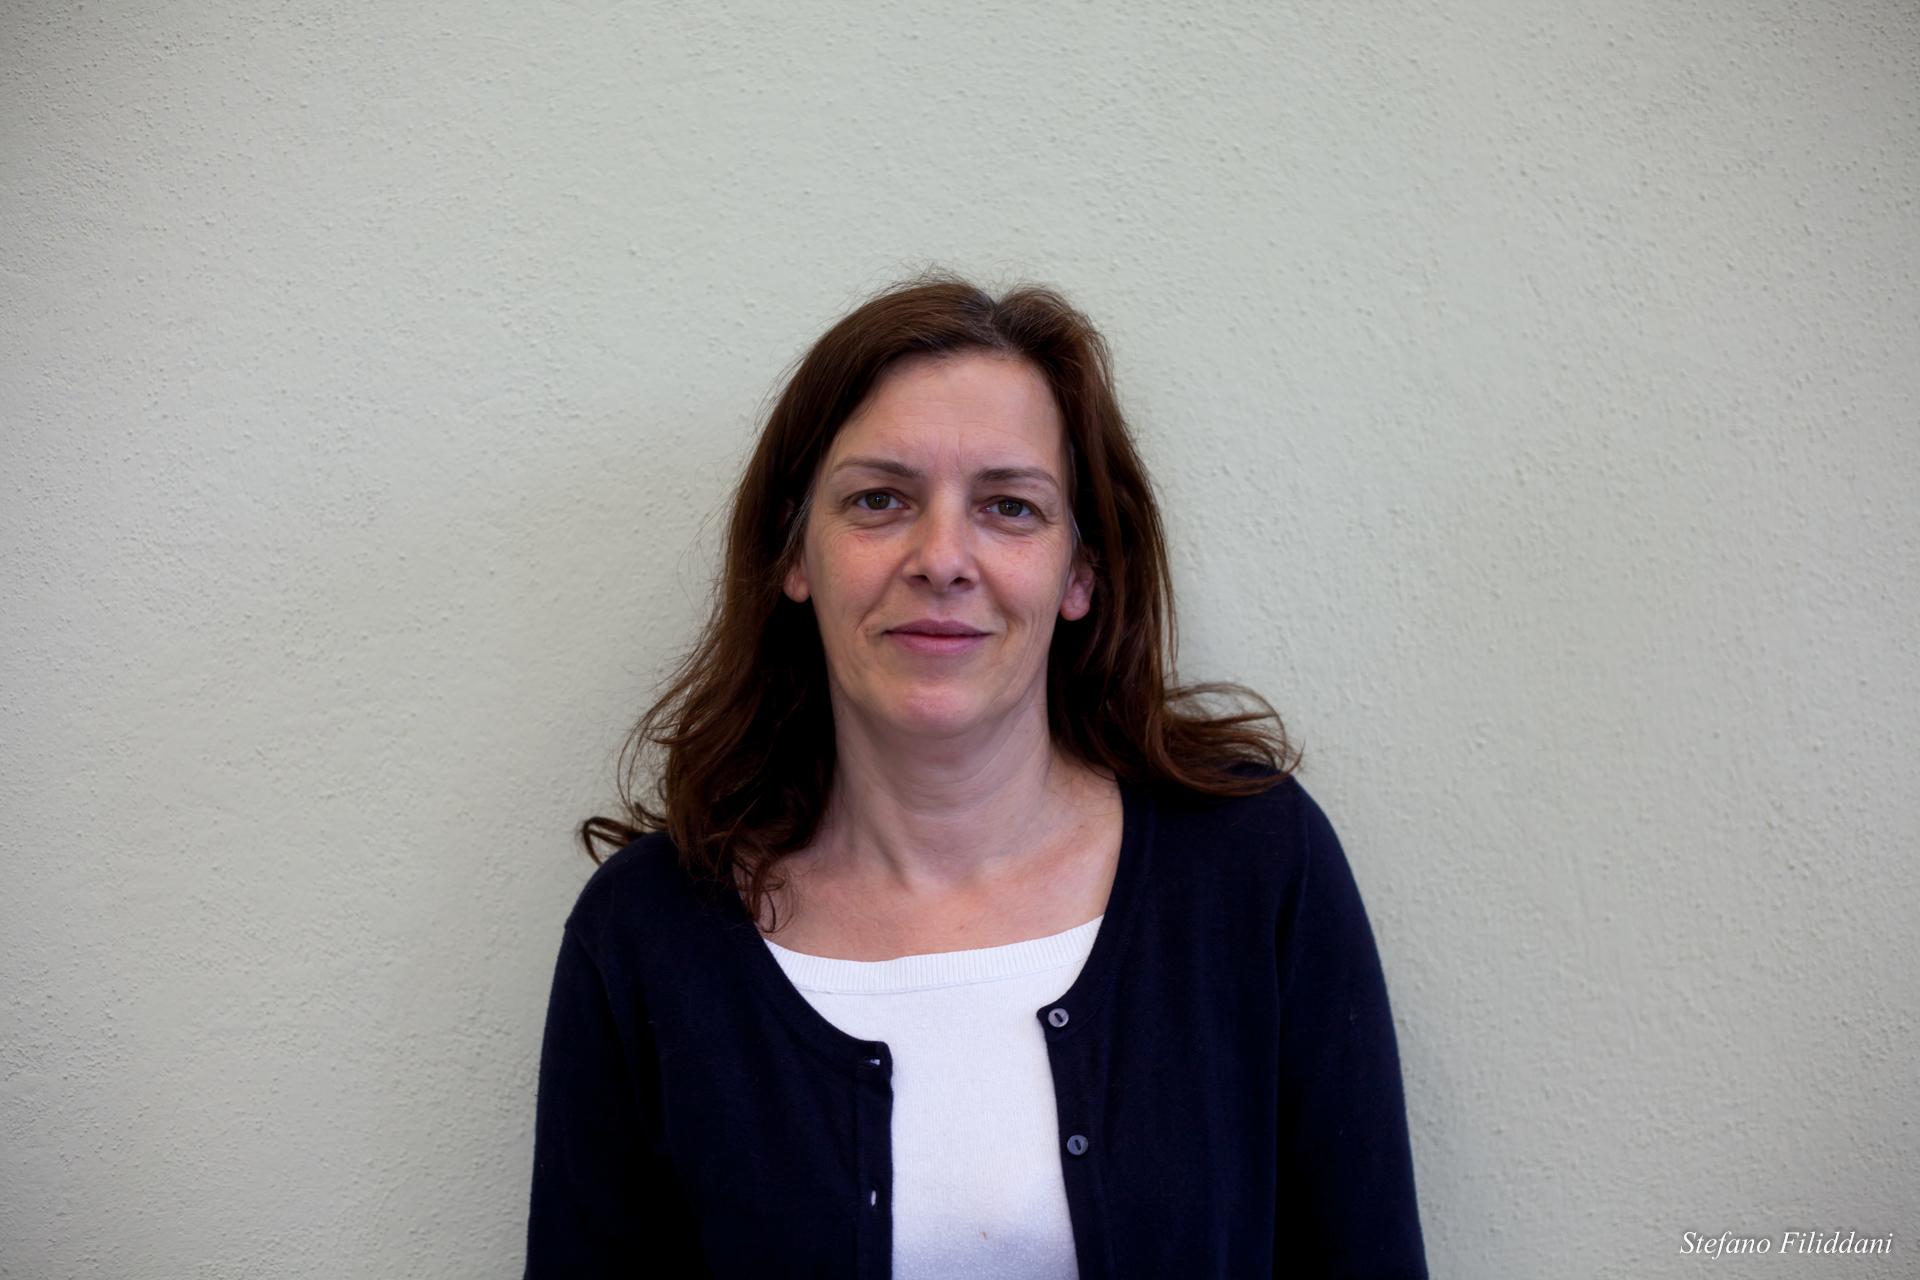 Loredana Biscardi